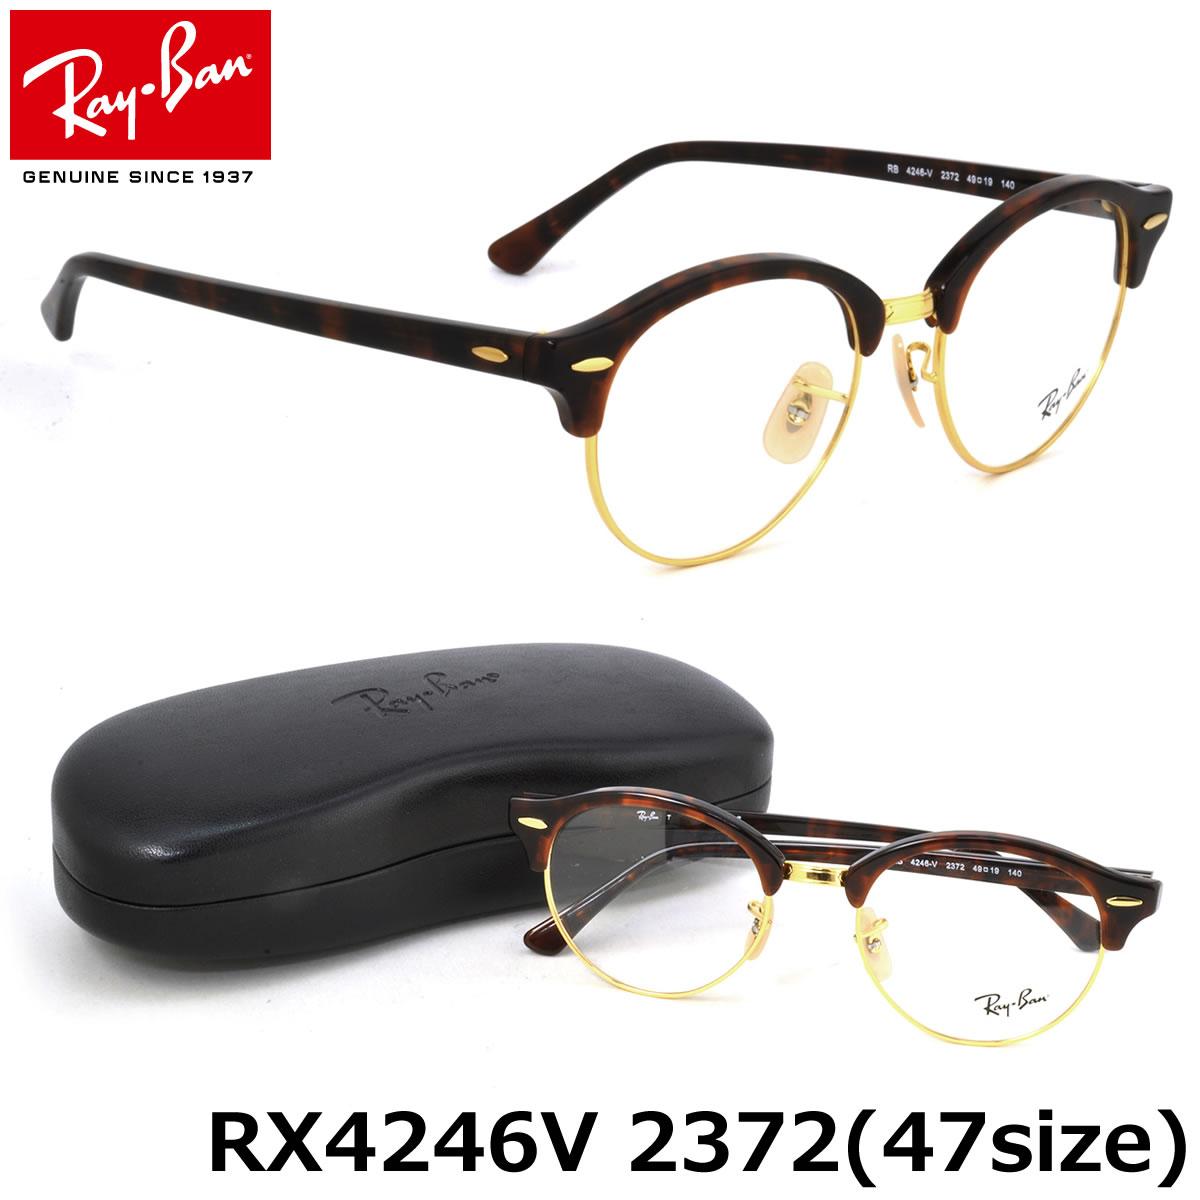 ee7632a850 ... ebay ray ban glasses frames rx4246v2372 47 size clove round club master  round round glasses ray